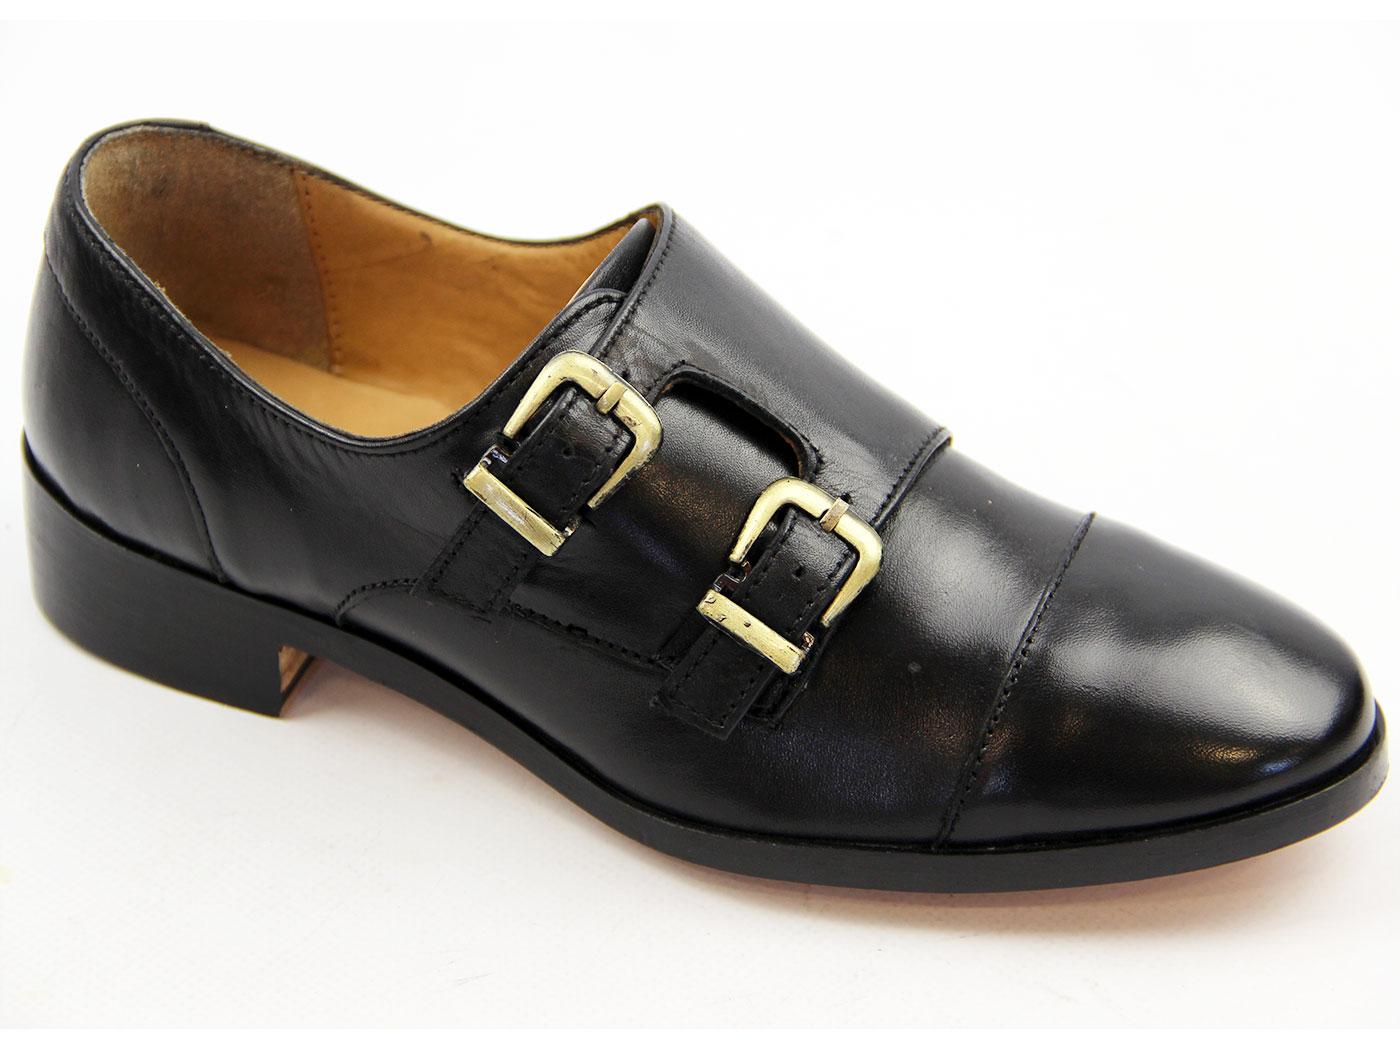 Calypso LACEYS Retro Monk Strap Toe Cap Shoes (B)